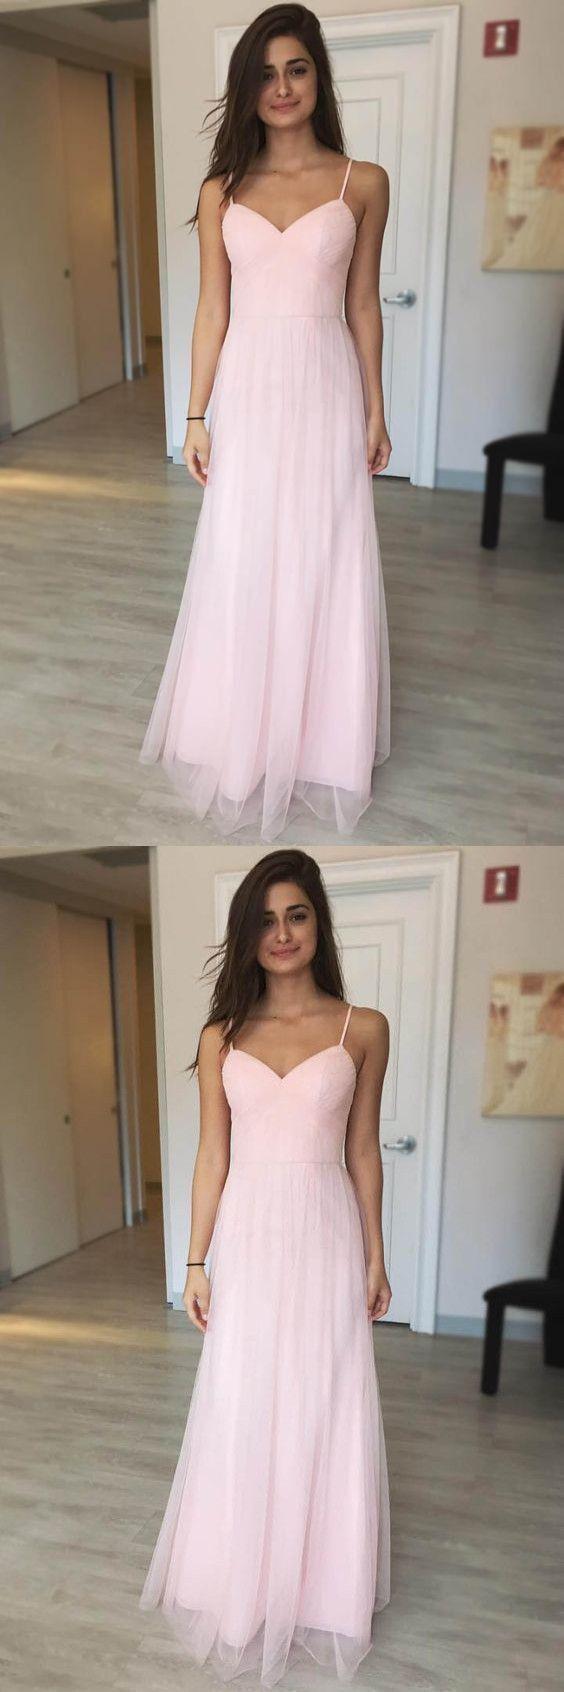 Pink chiffon prom dress long prom dresses spaghetti straps aline